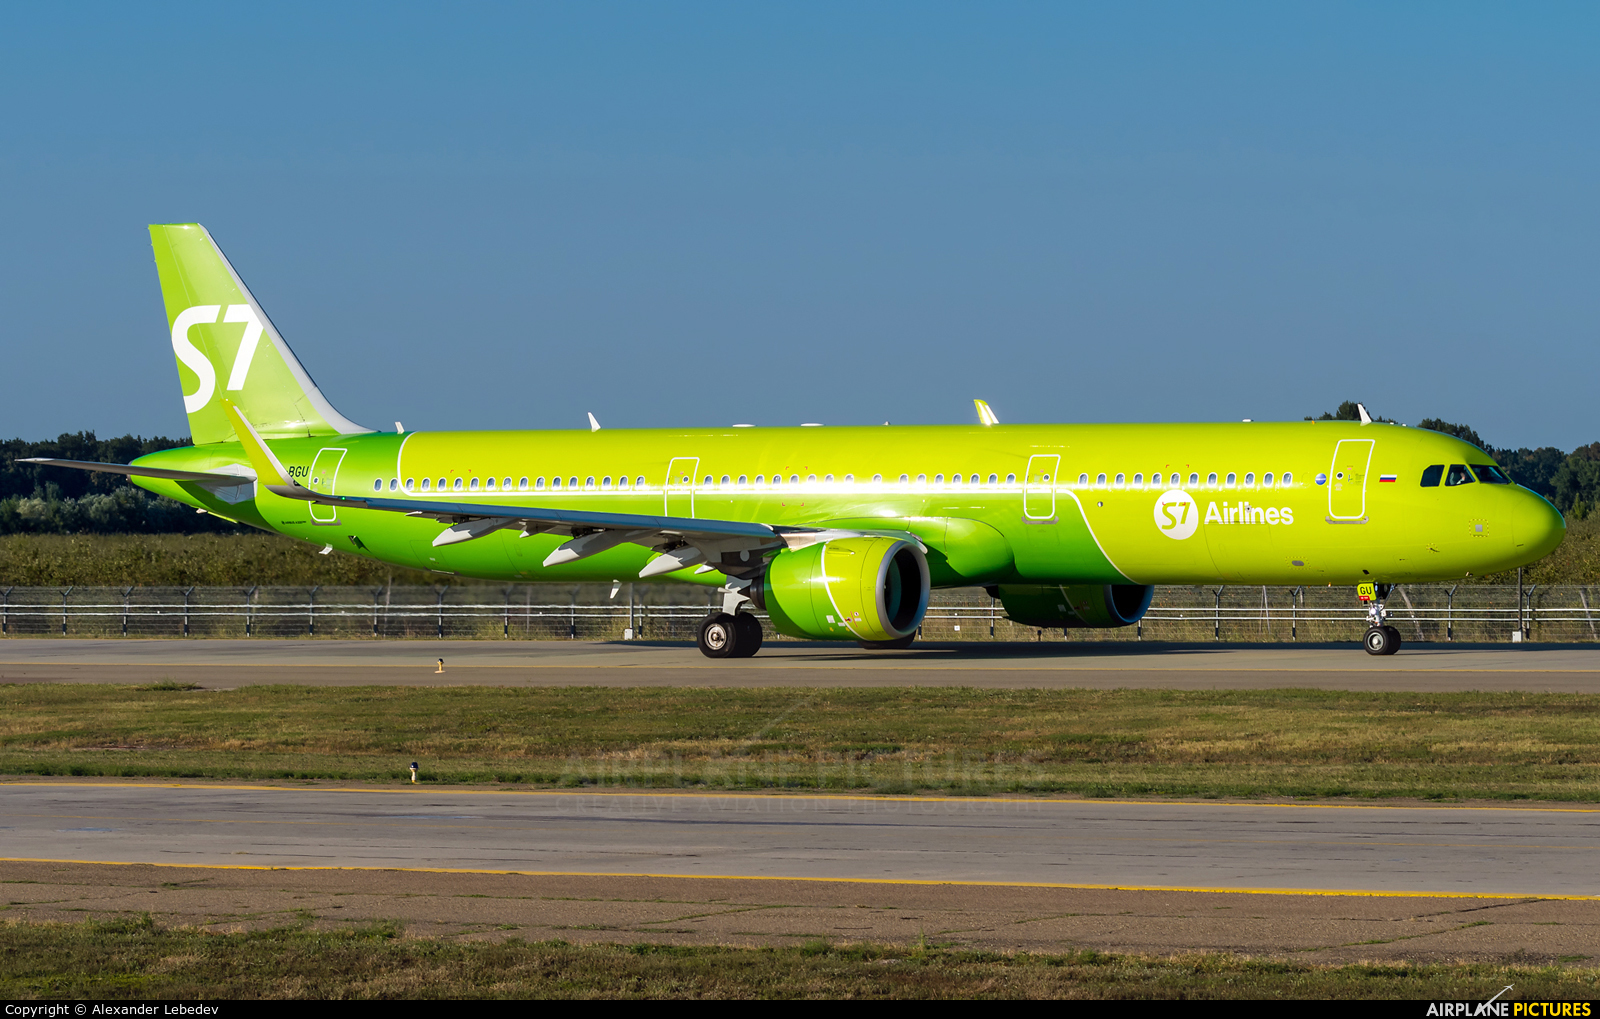 S7 Airlines VQ-BGU aircraft at Krasnodar